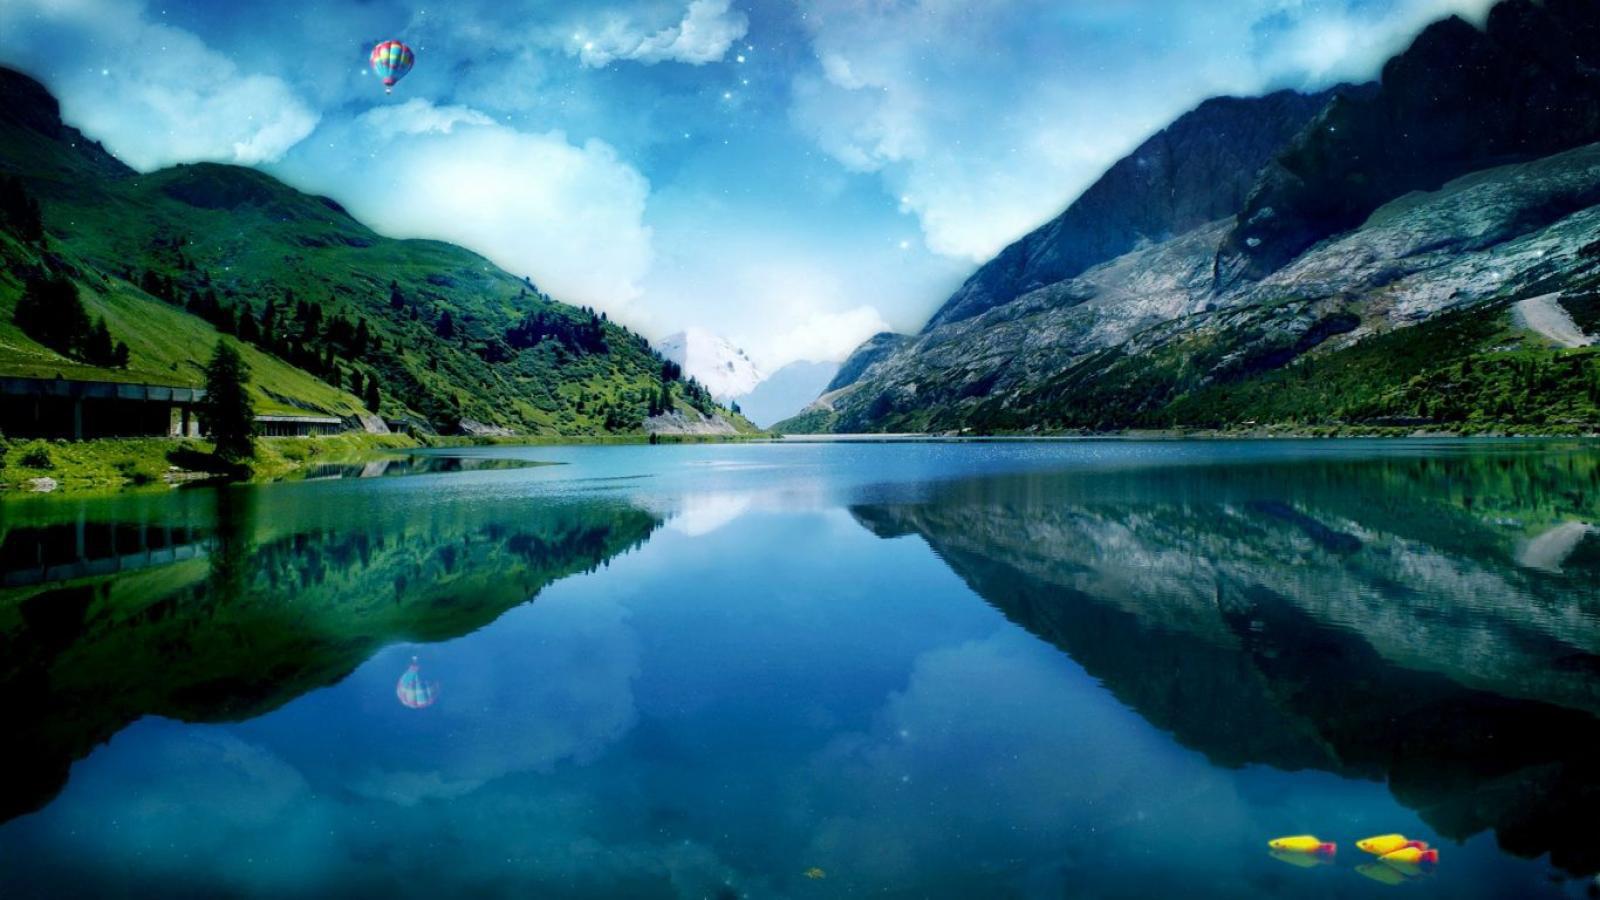 mountain lake reflections wallpapers - Mountain Lake Reflections Wallpapers desktopimages